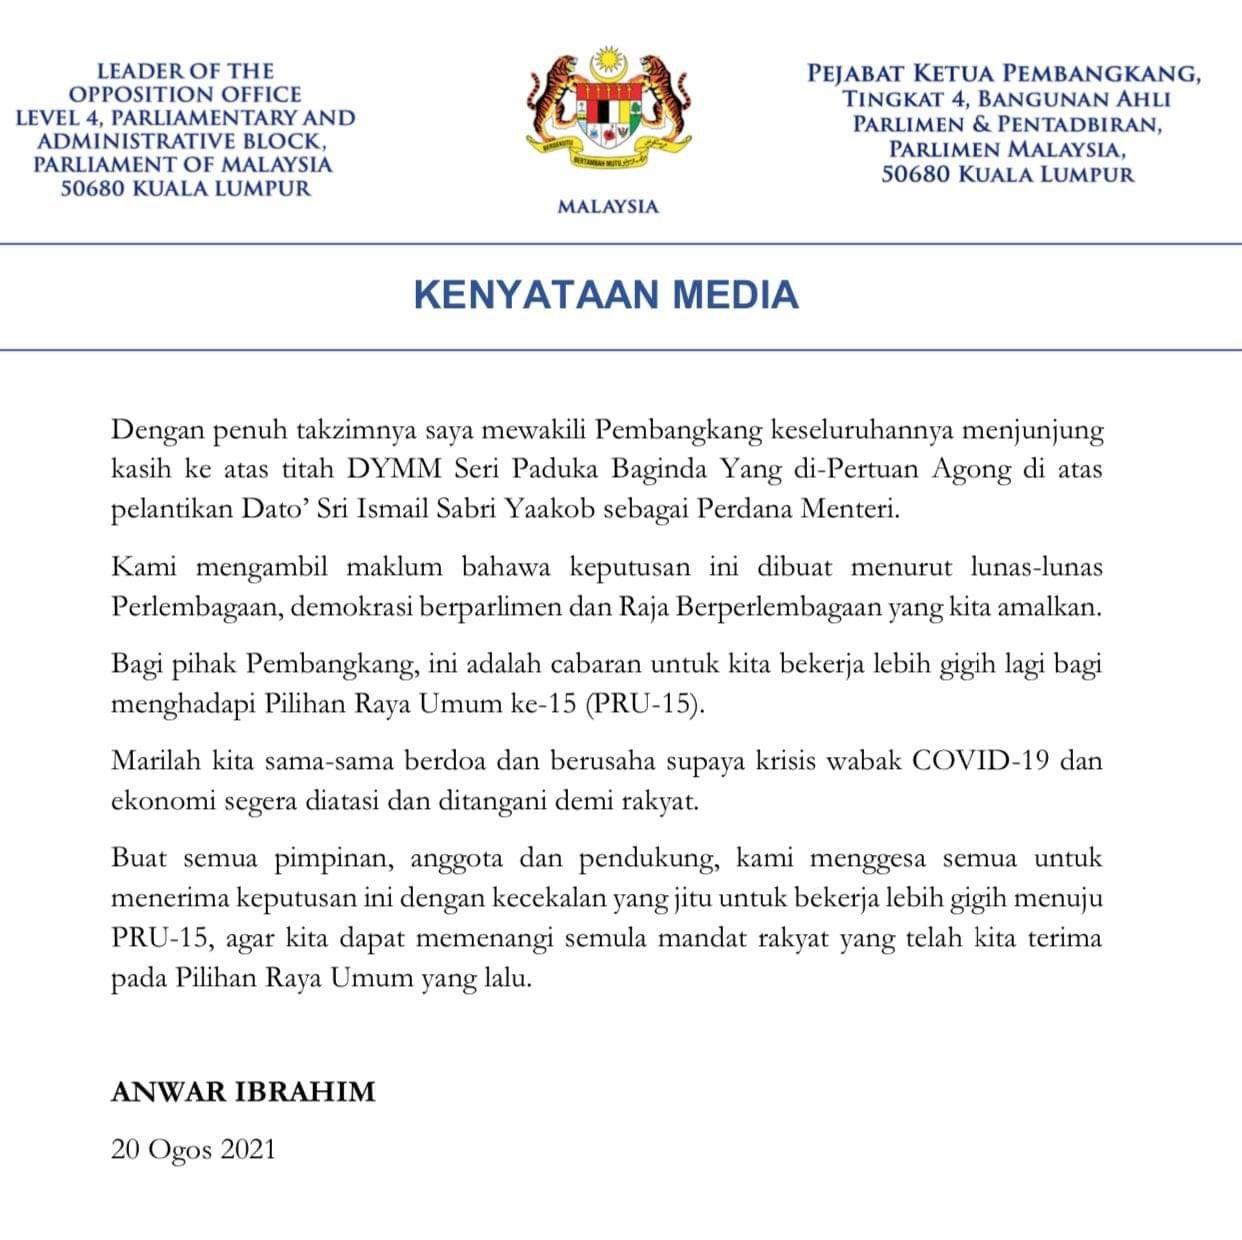 Kenyataan Media Ketua Pembangkang - Anwar Ibrahim